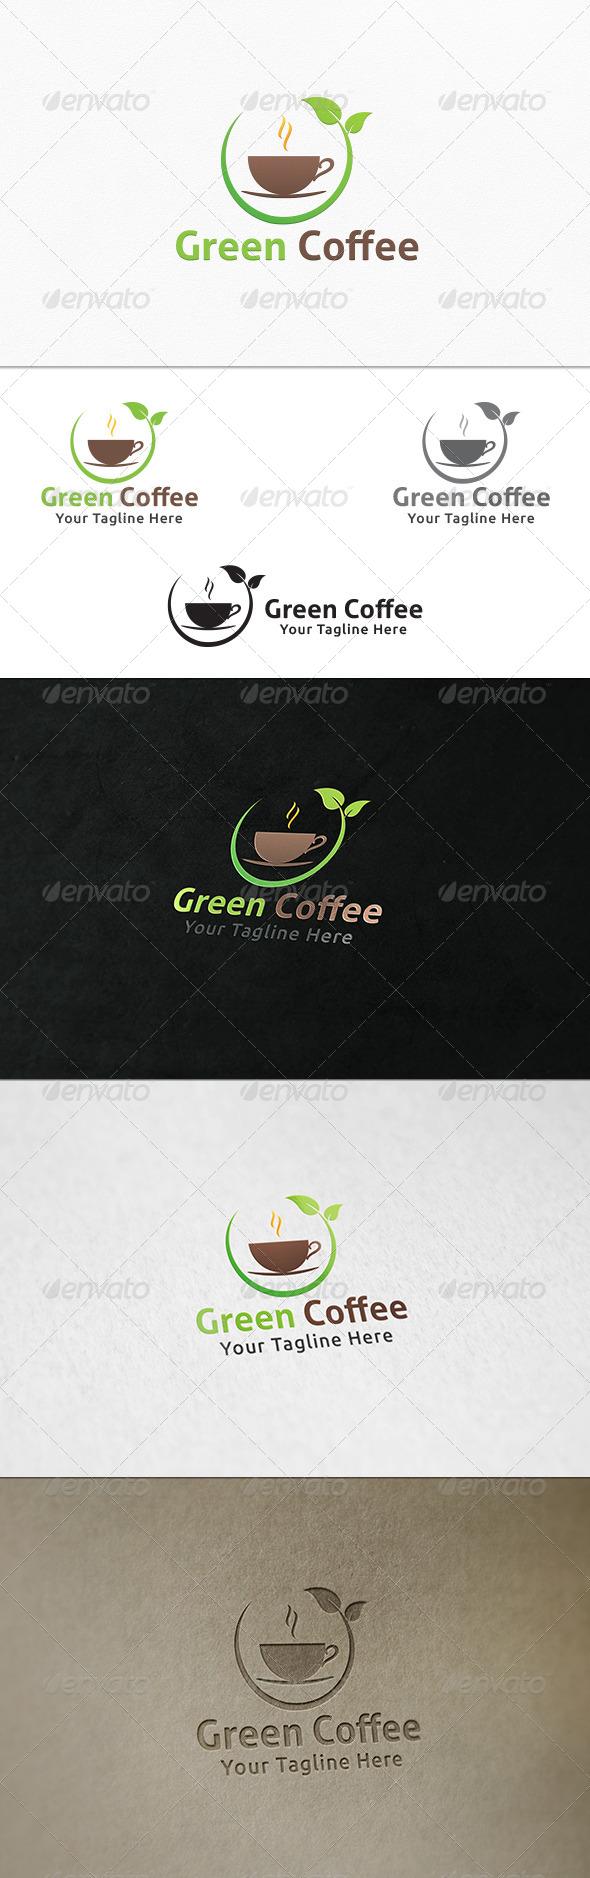 GraphicRiver Green Coffee Logo Template 7863977